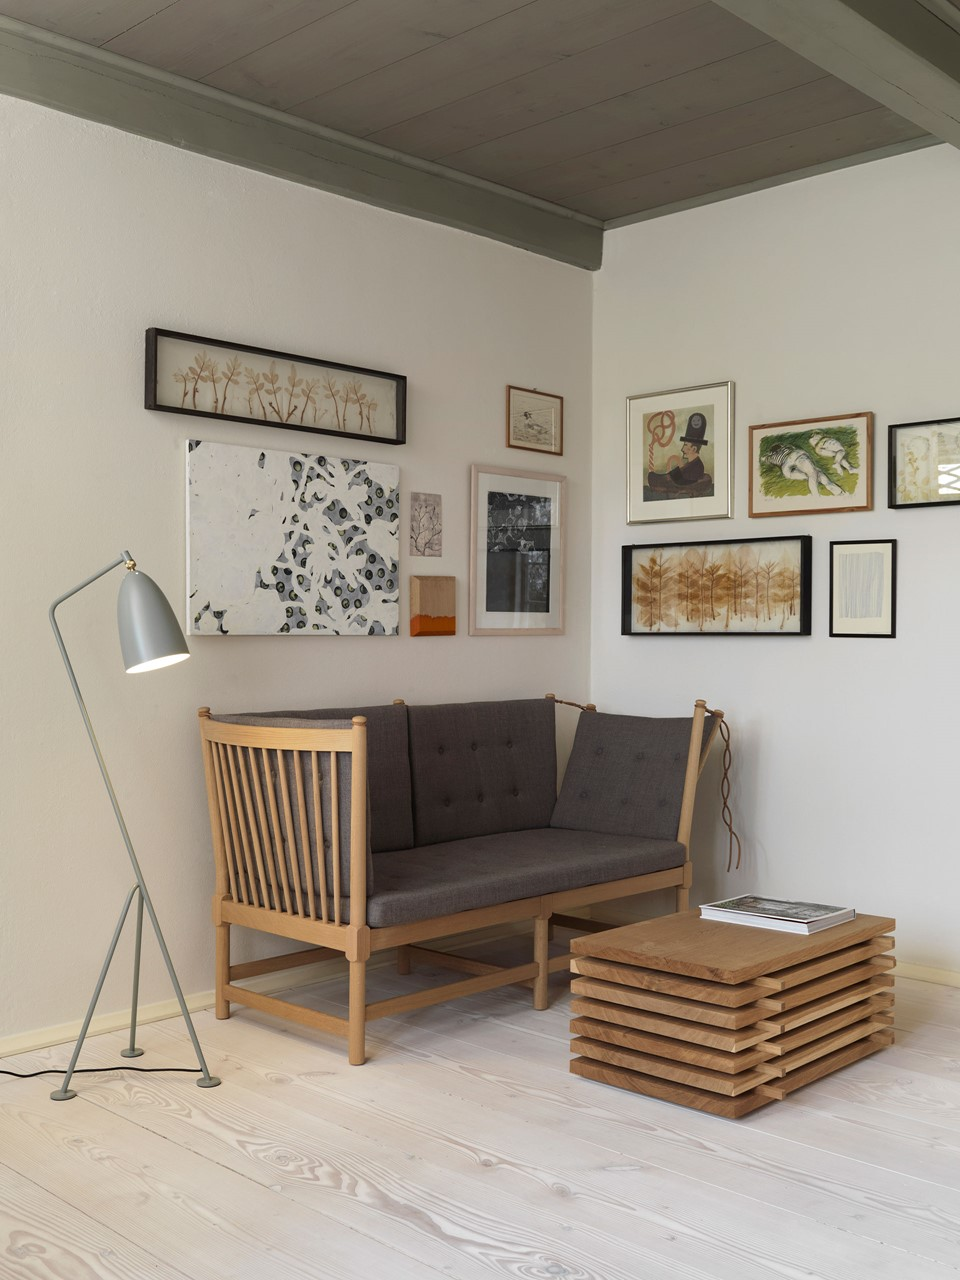 douglas fir floor lye white soap underfloor heating sofa hygge dinesen country home.jpg